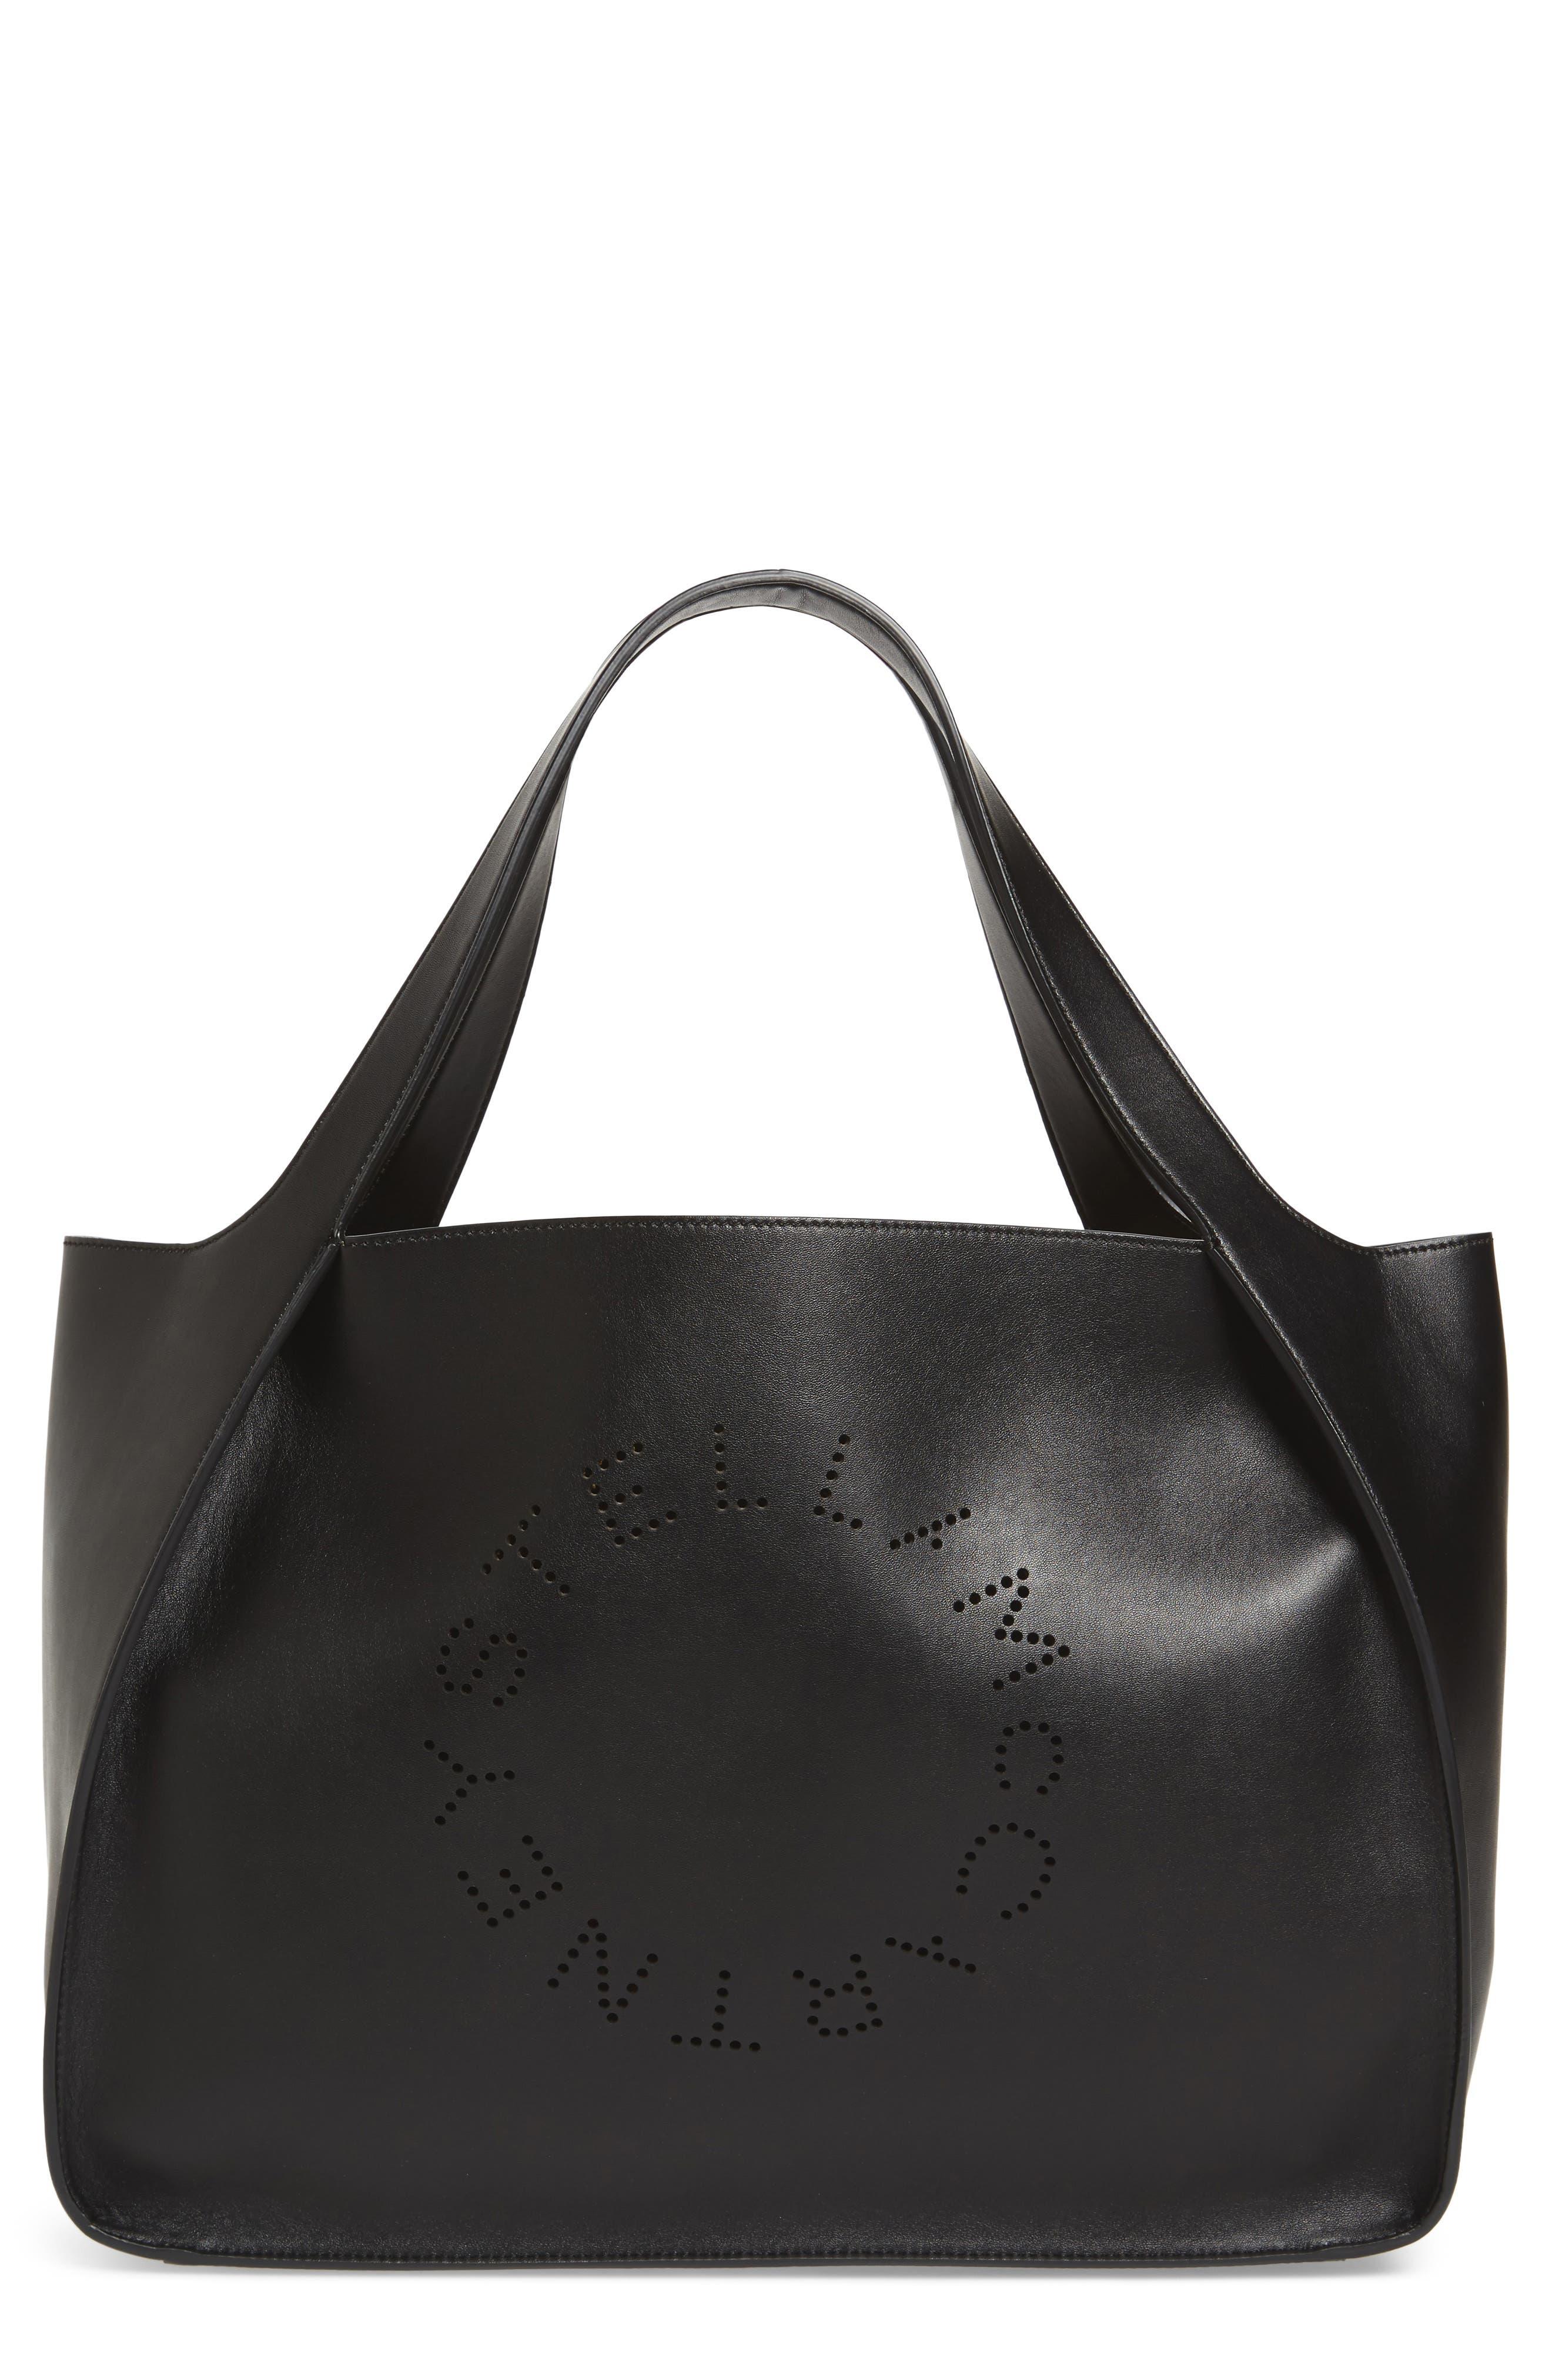 STELLA MCCARTNEY Medium Perforated Logo Faux Leather Tote, Main, color, BLACK